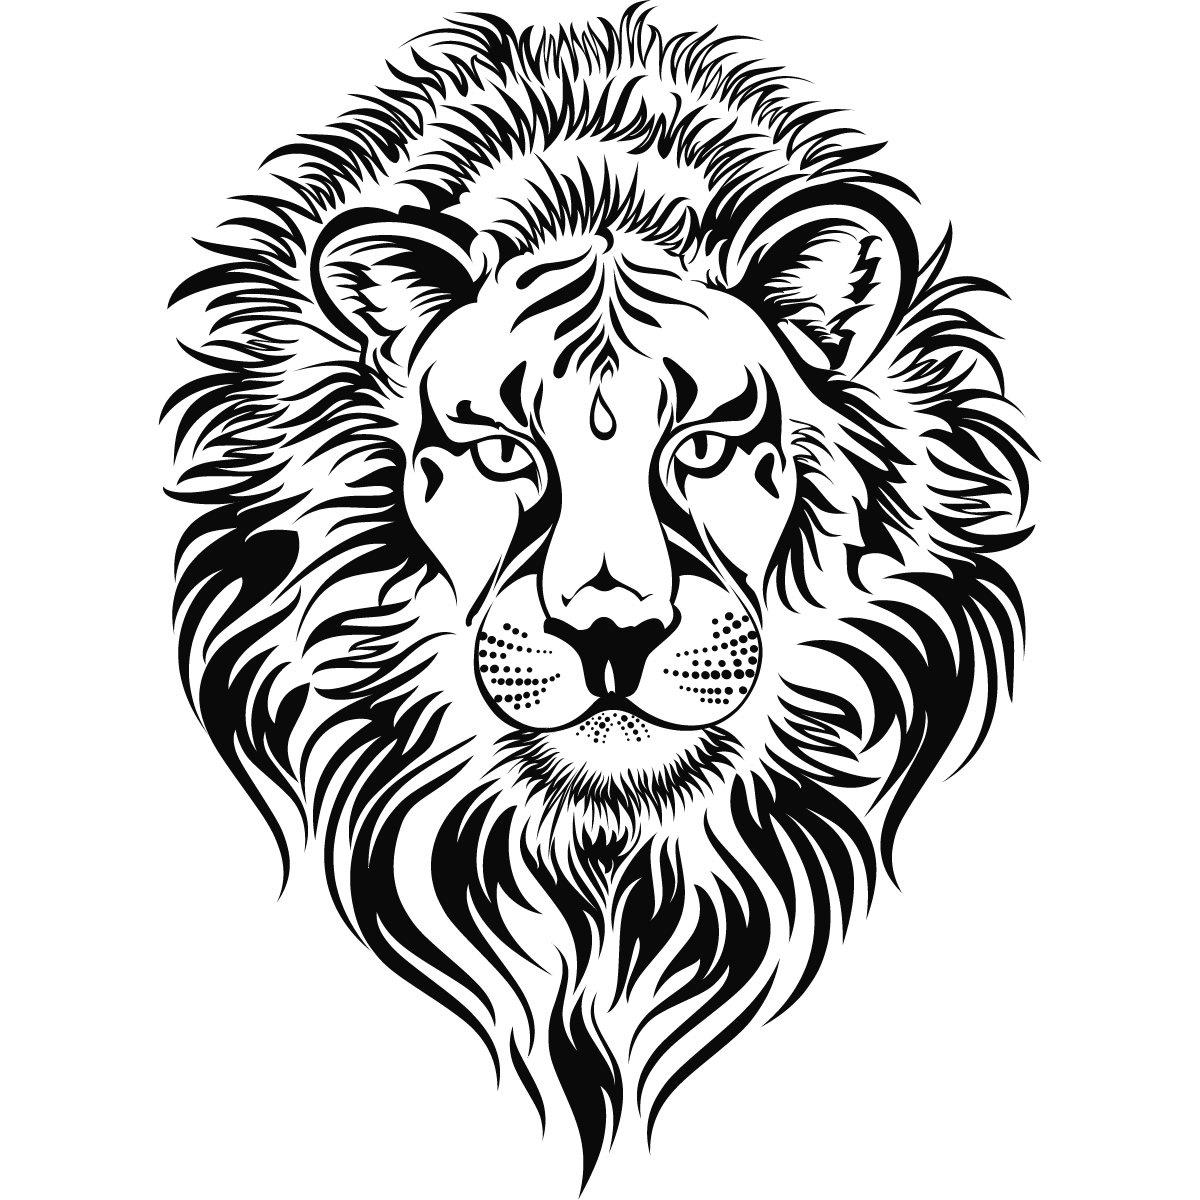 Big Cat clipart lion outline Lions Wall Art Sticker Cats